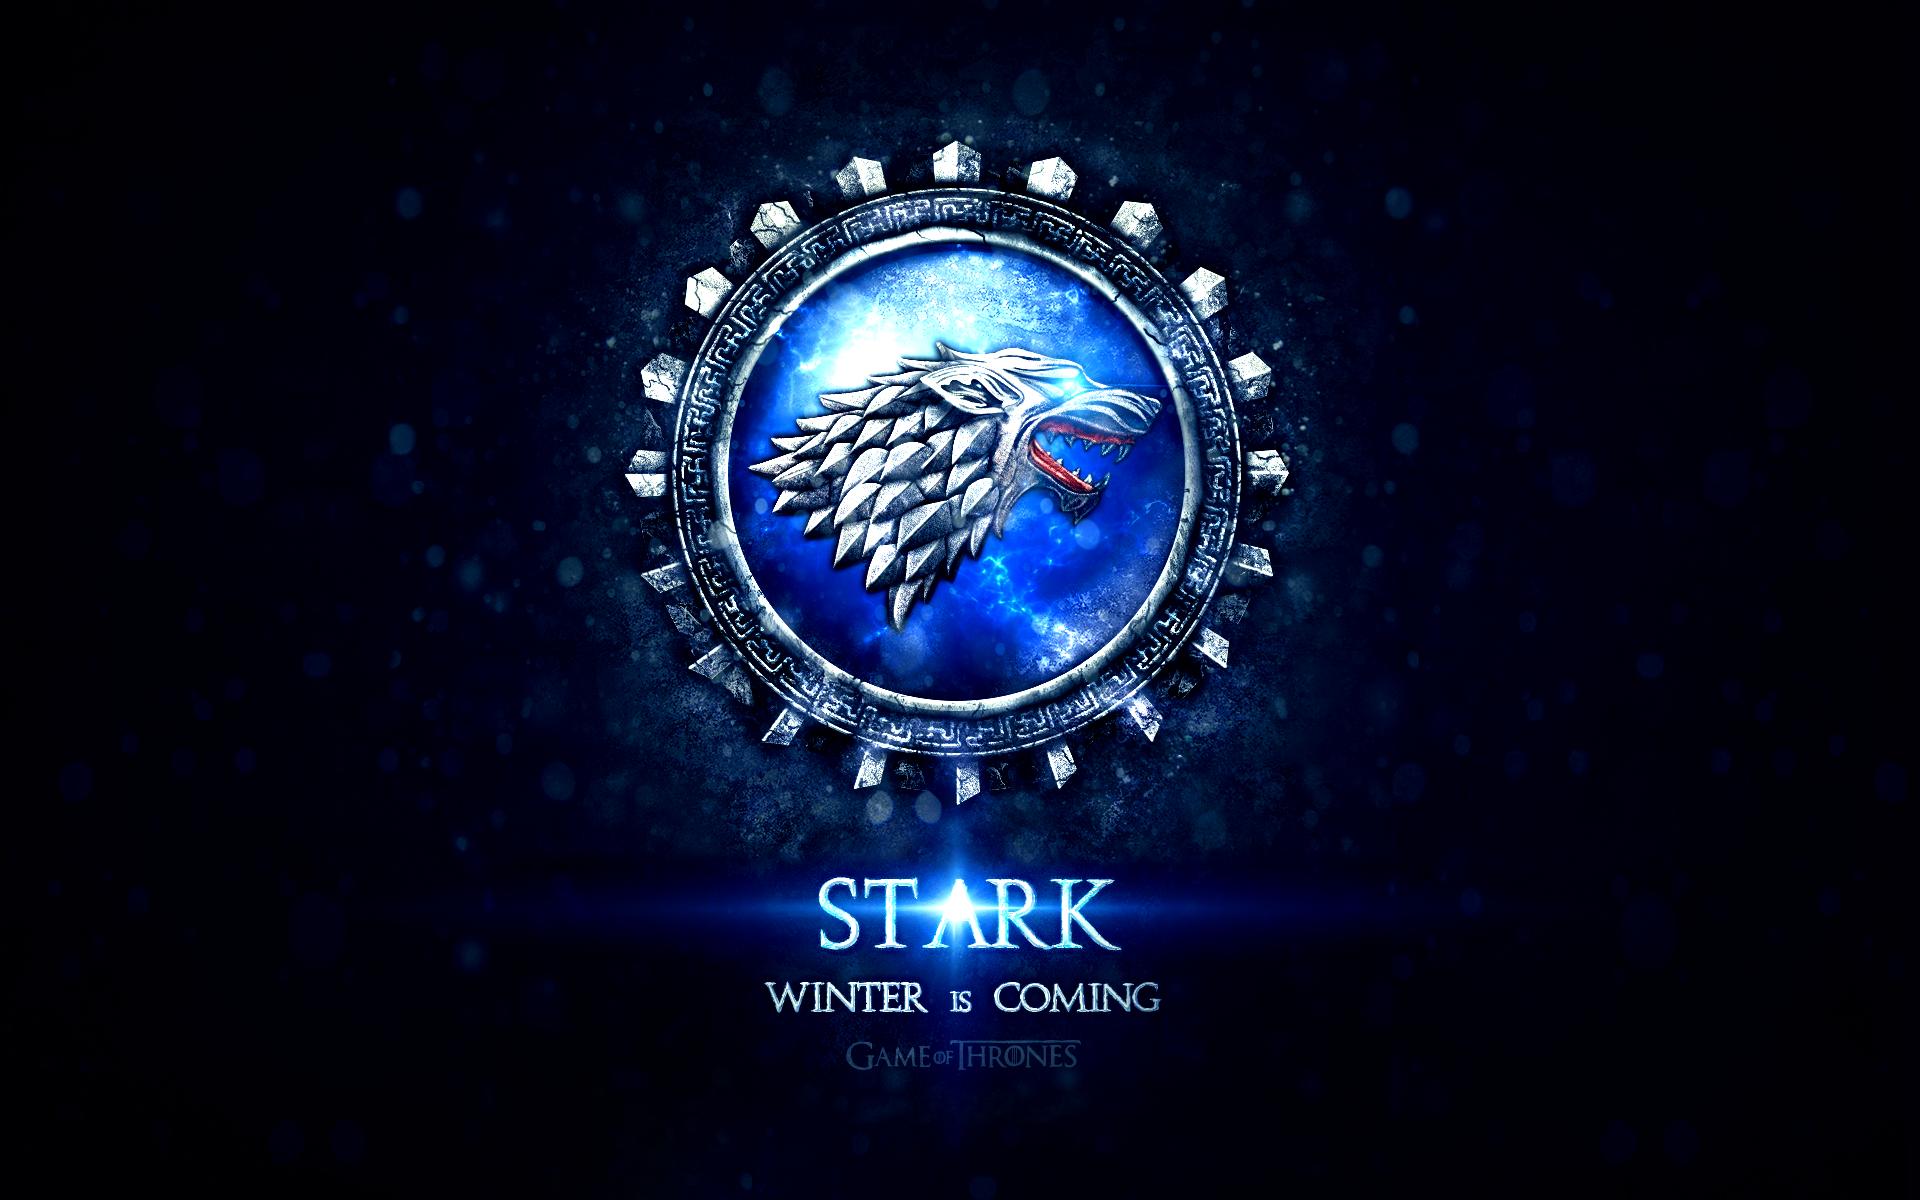 201417375game of thrones stark wallpaper by jjfwh d5hukjppng 1920x1200